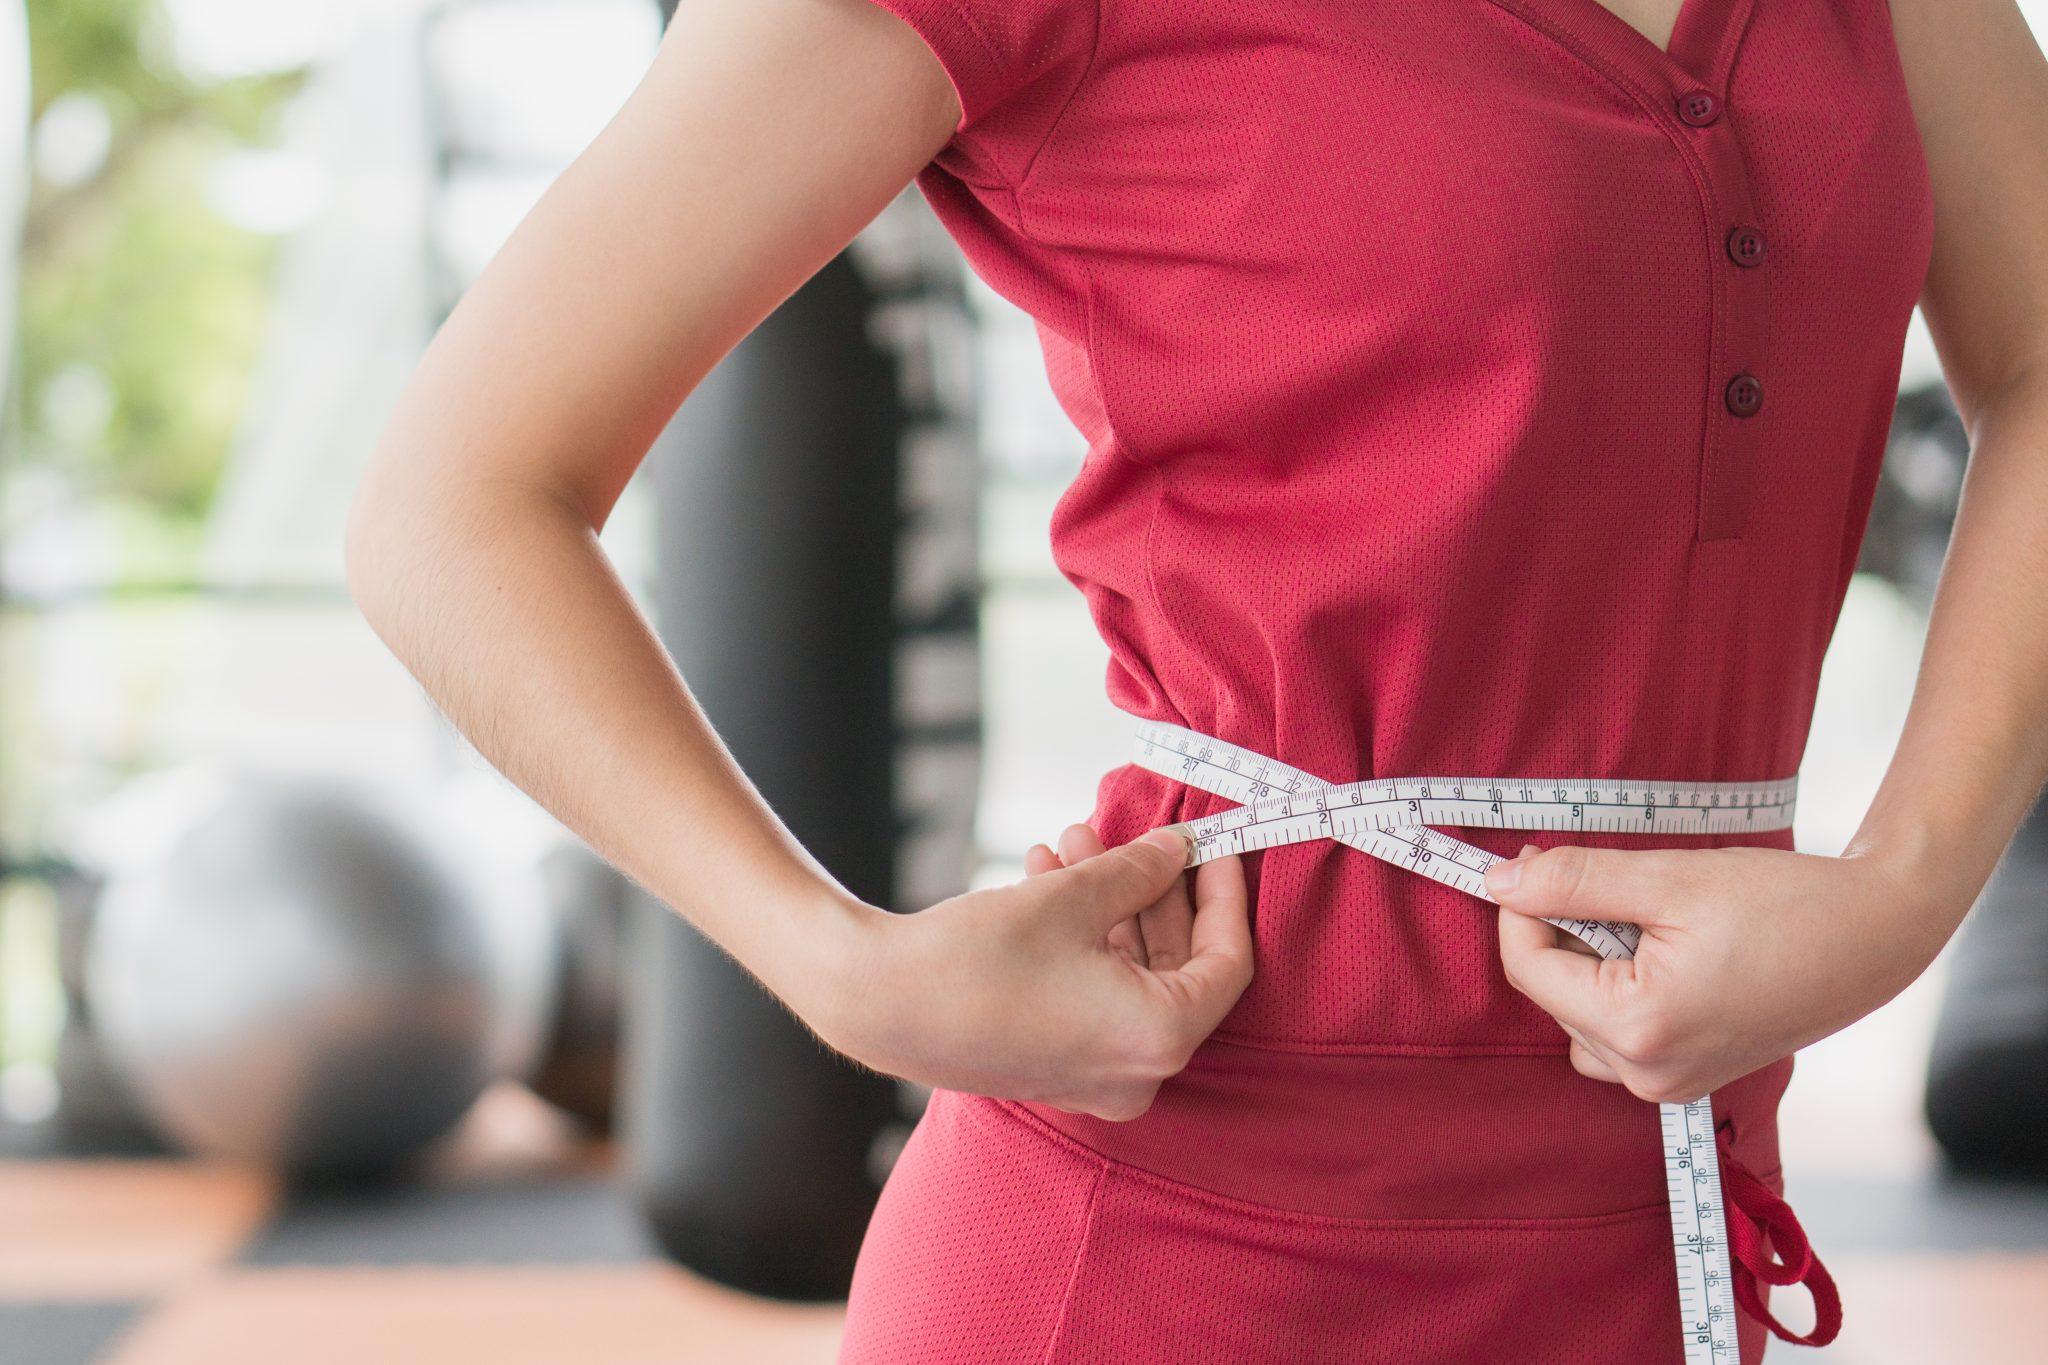 propol s dlya shudnennya prost recepti 1 - Прополіс для схуднення – прості рецепти